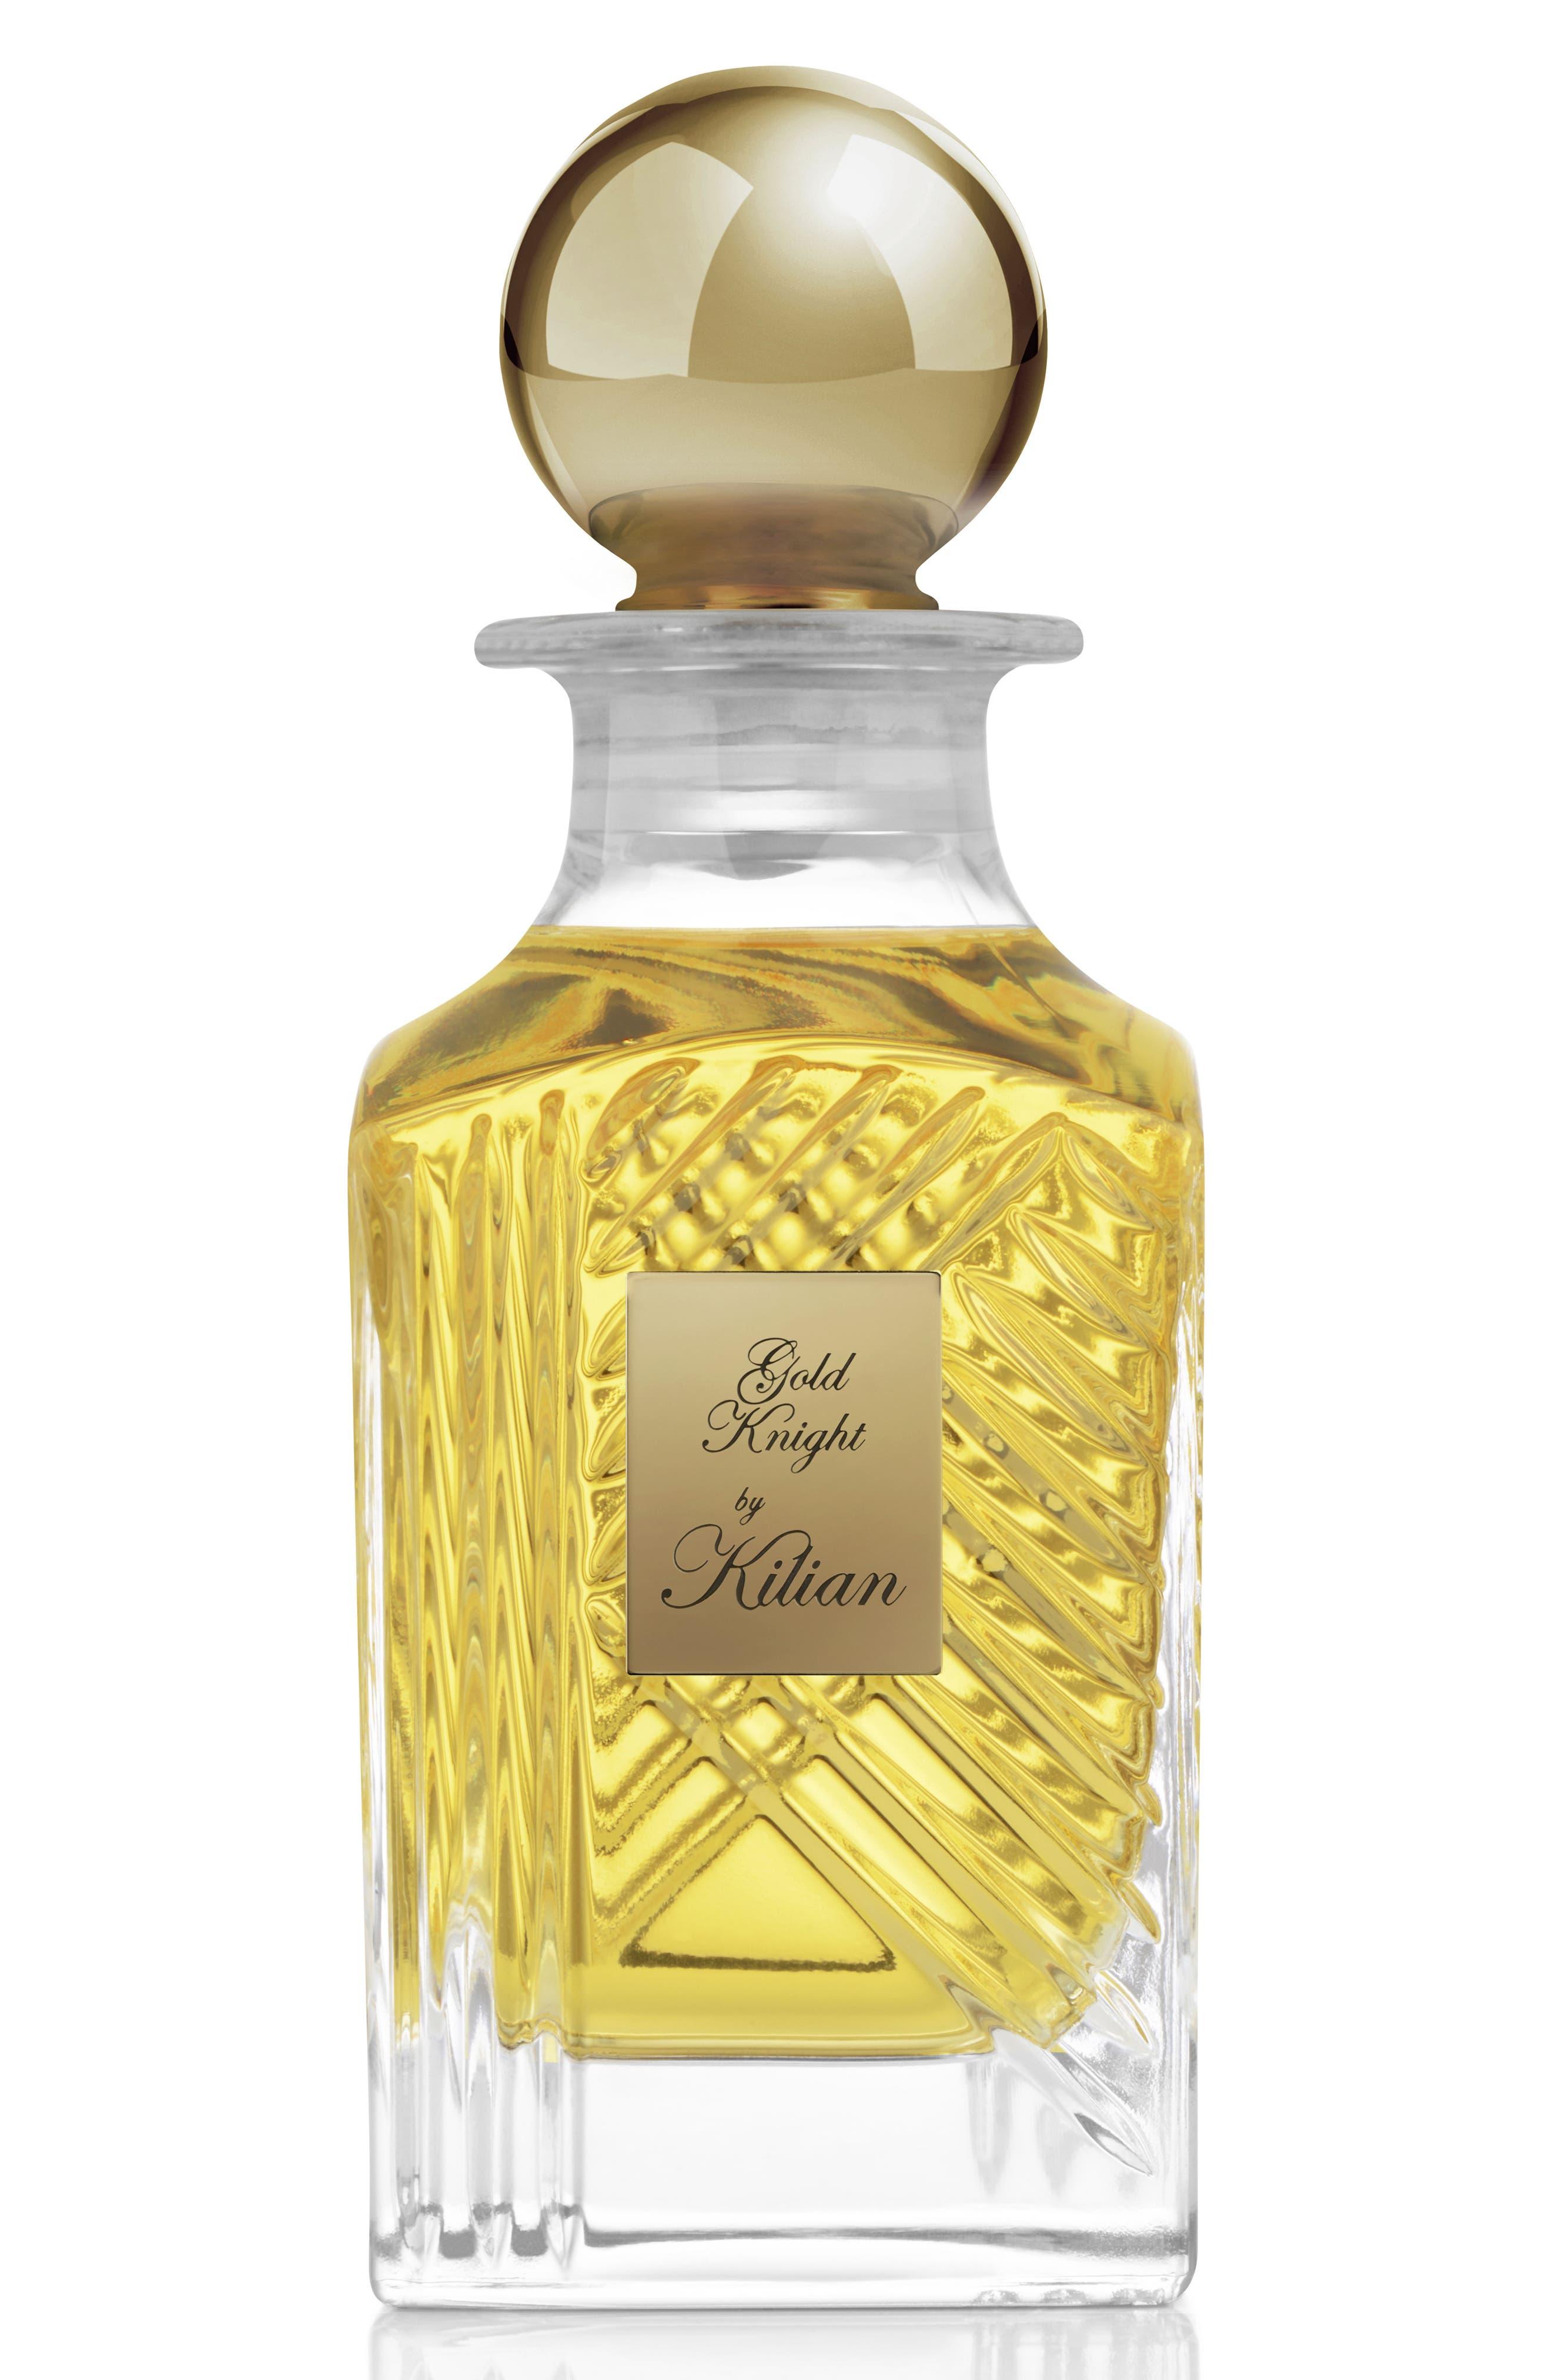 Gold Knight Mini Carafe Collector's Edition,                             Main thumbnail 1, color,                             No Color